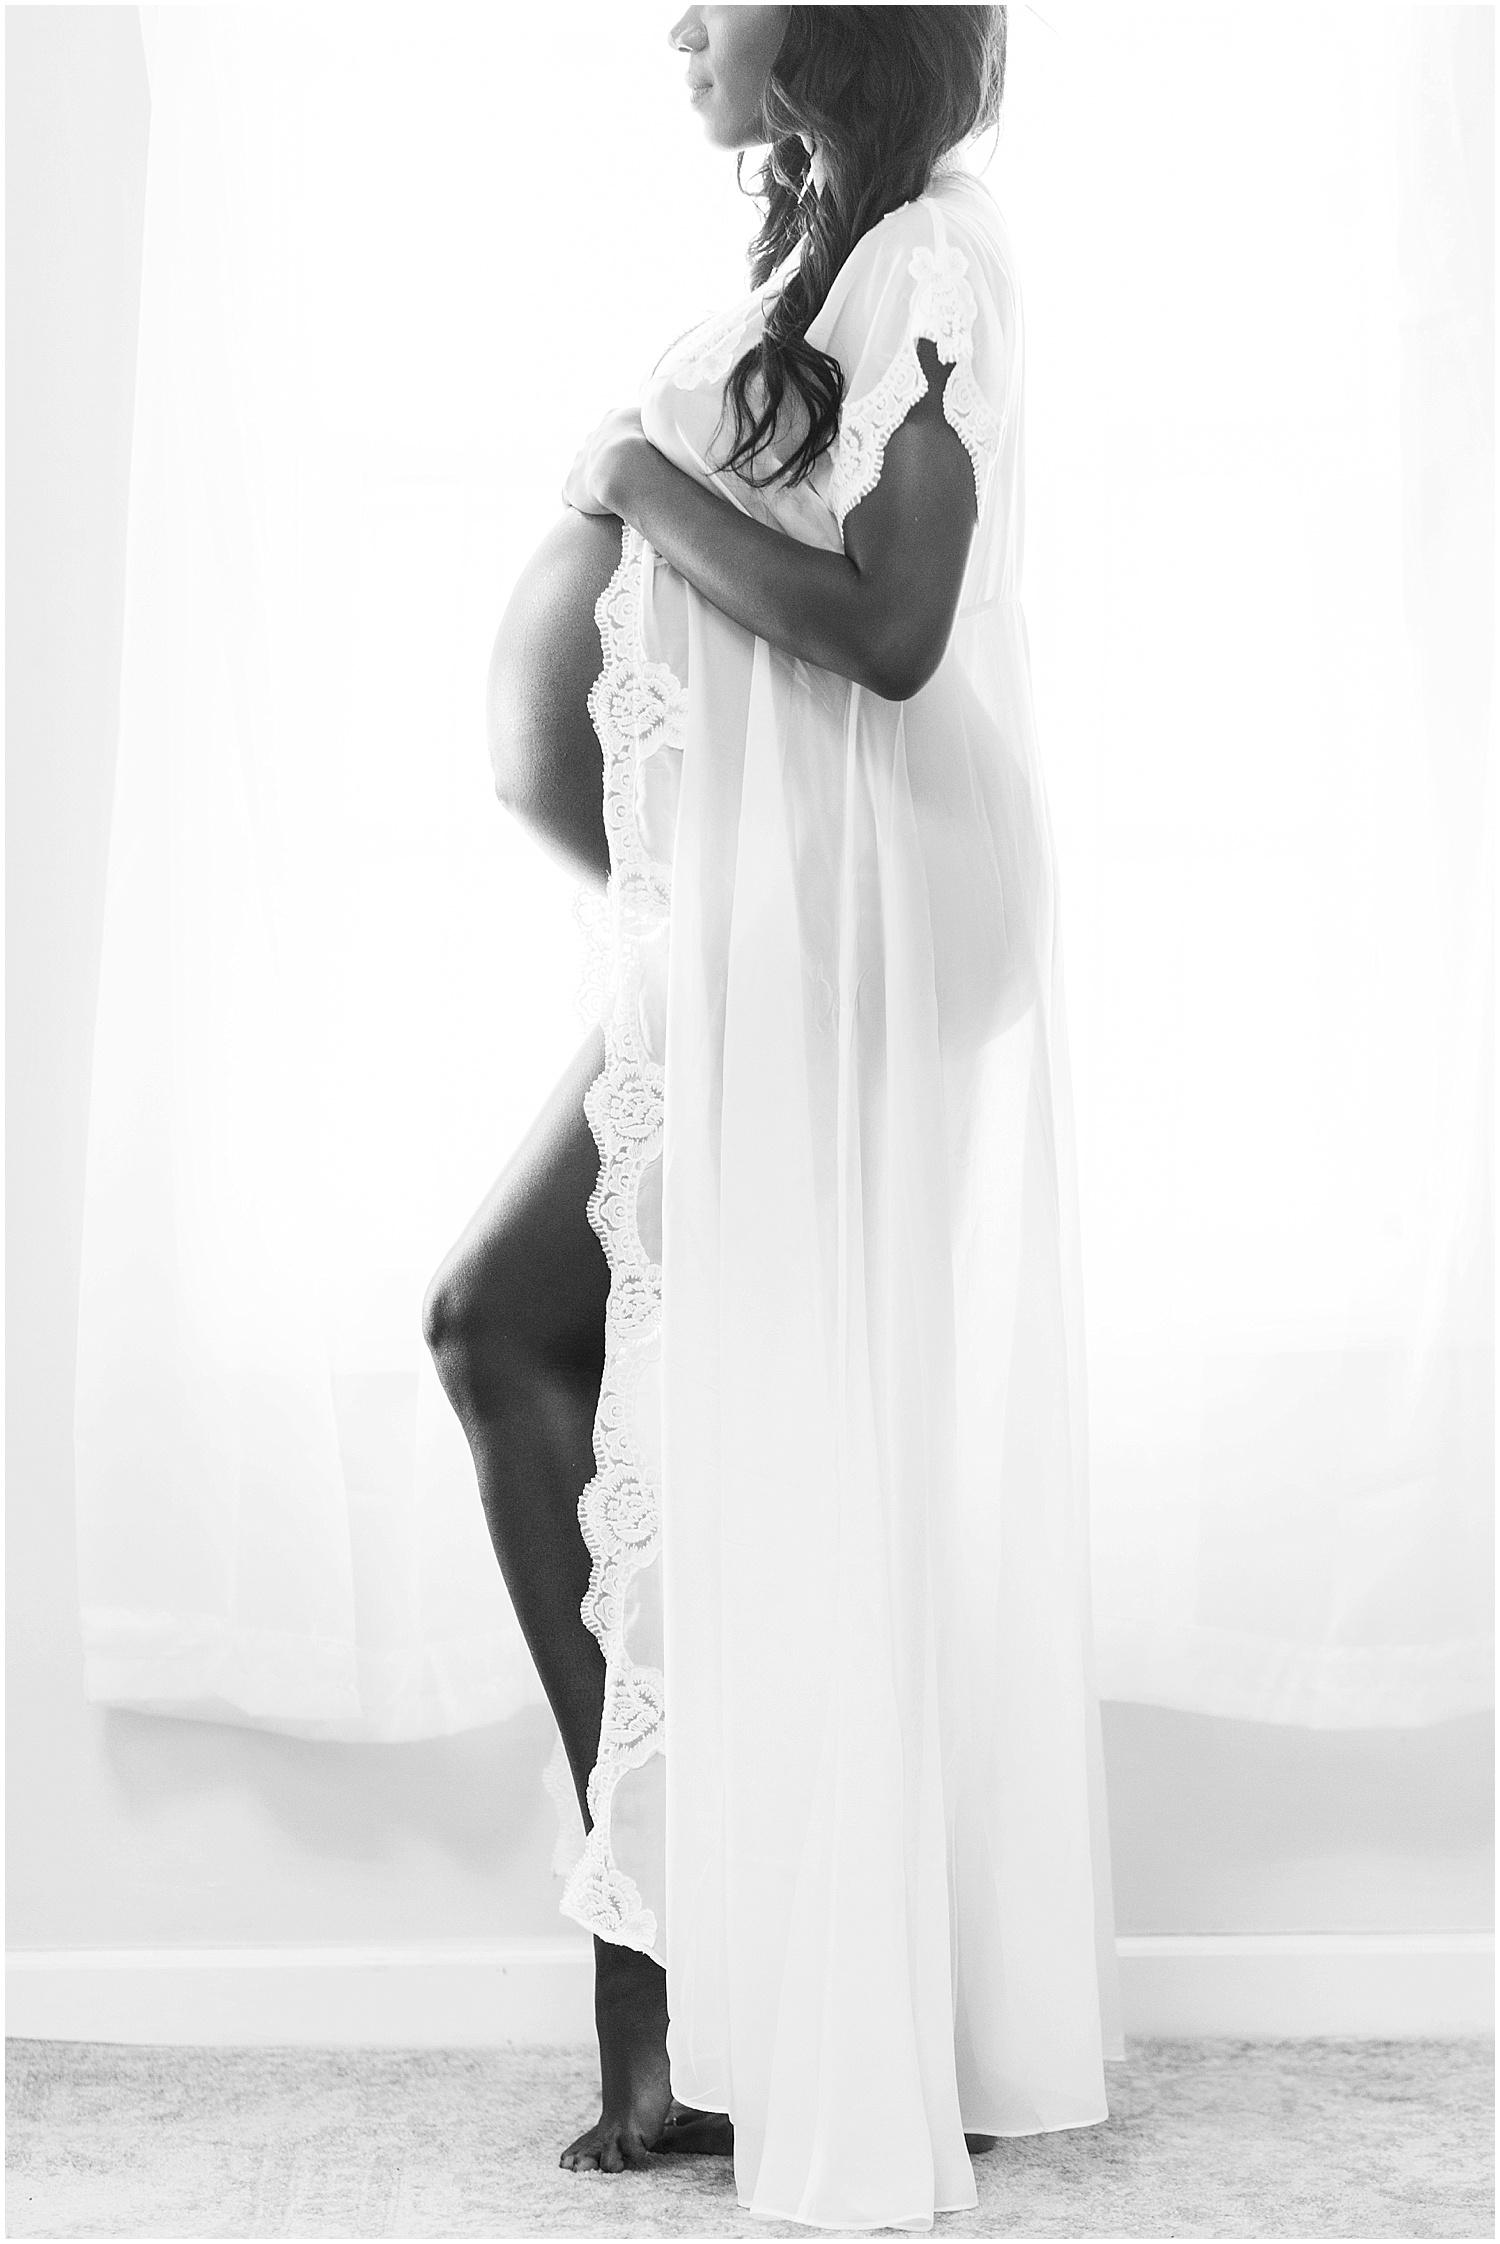 san_francisco_maternity_photographer-06.jpg